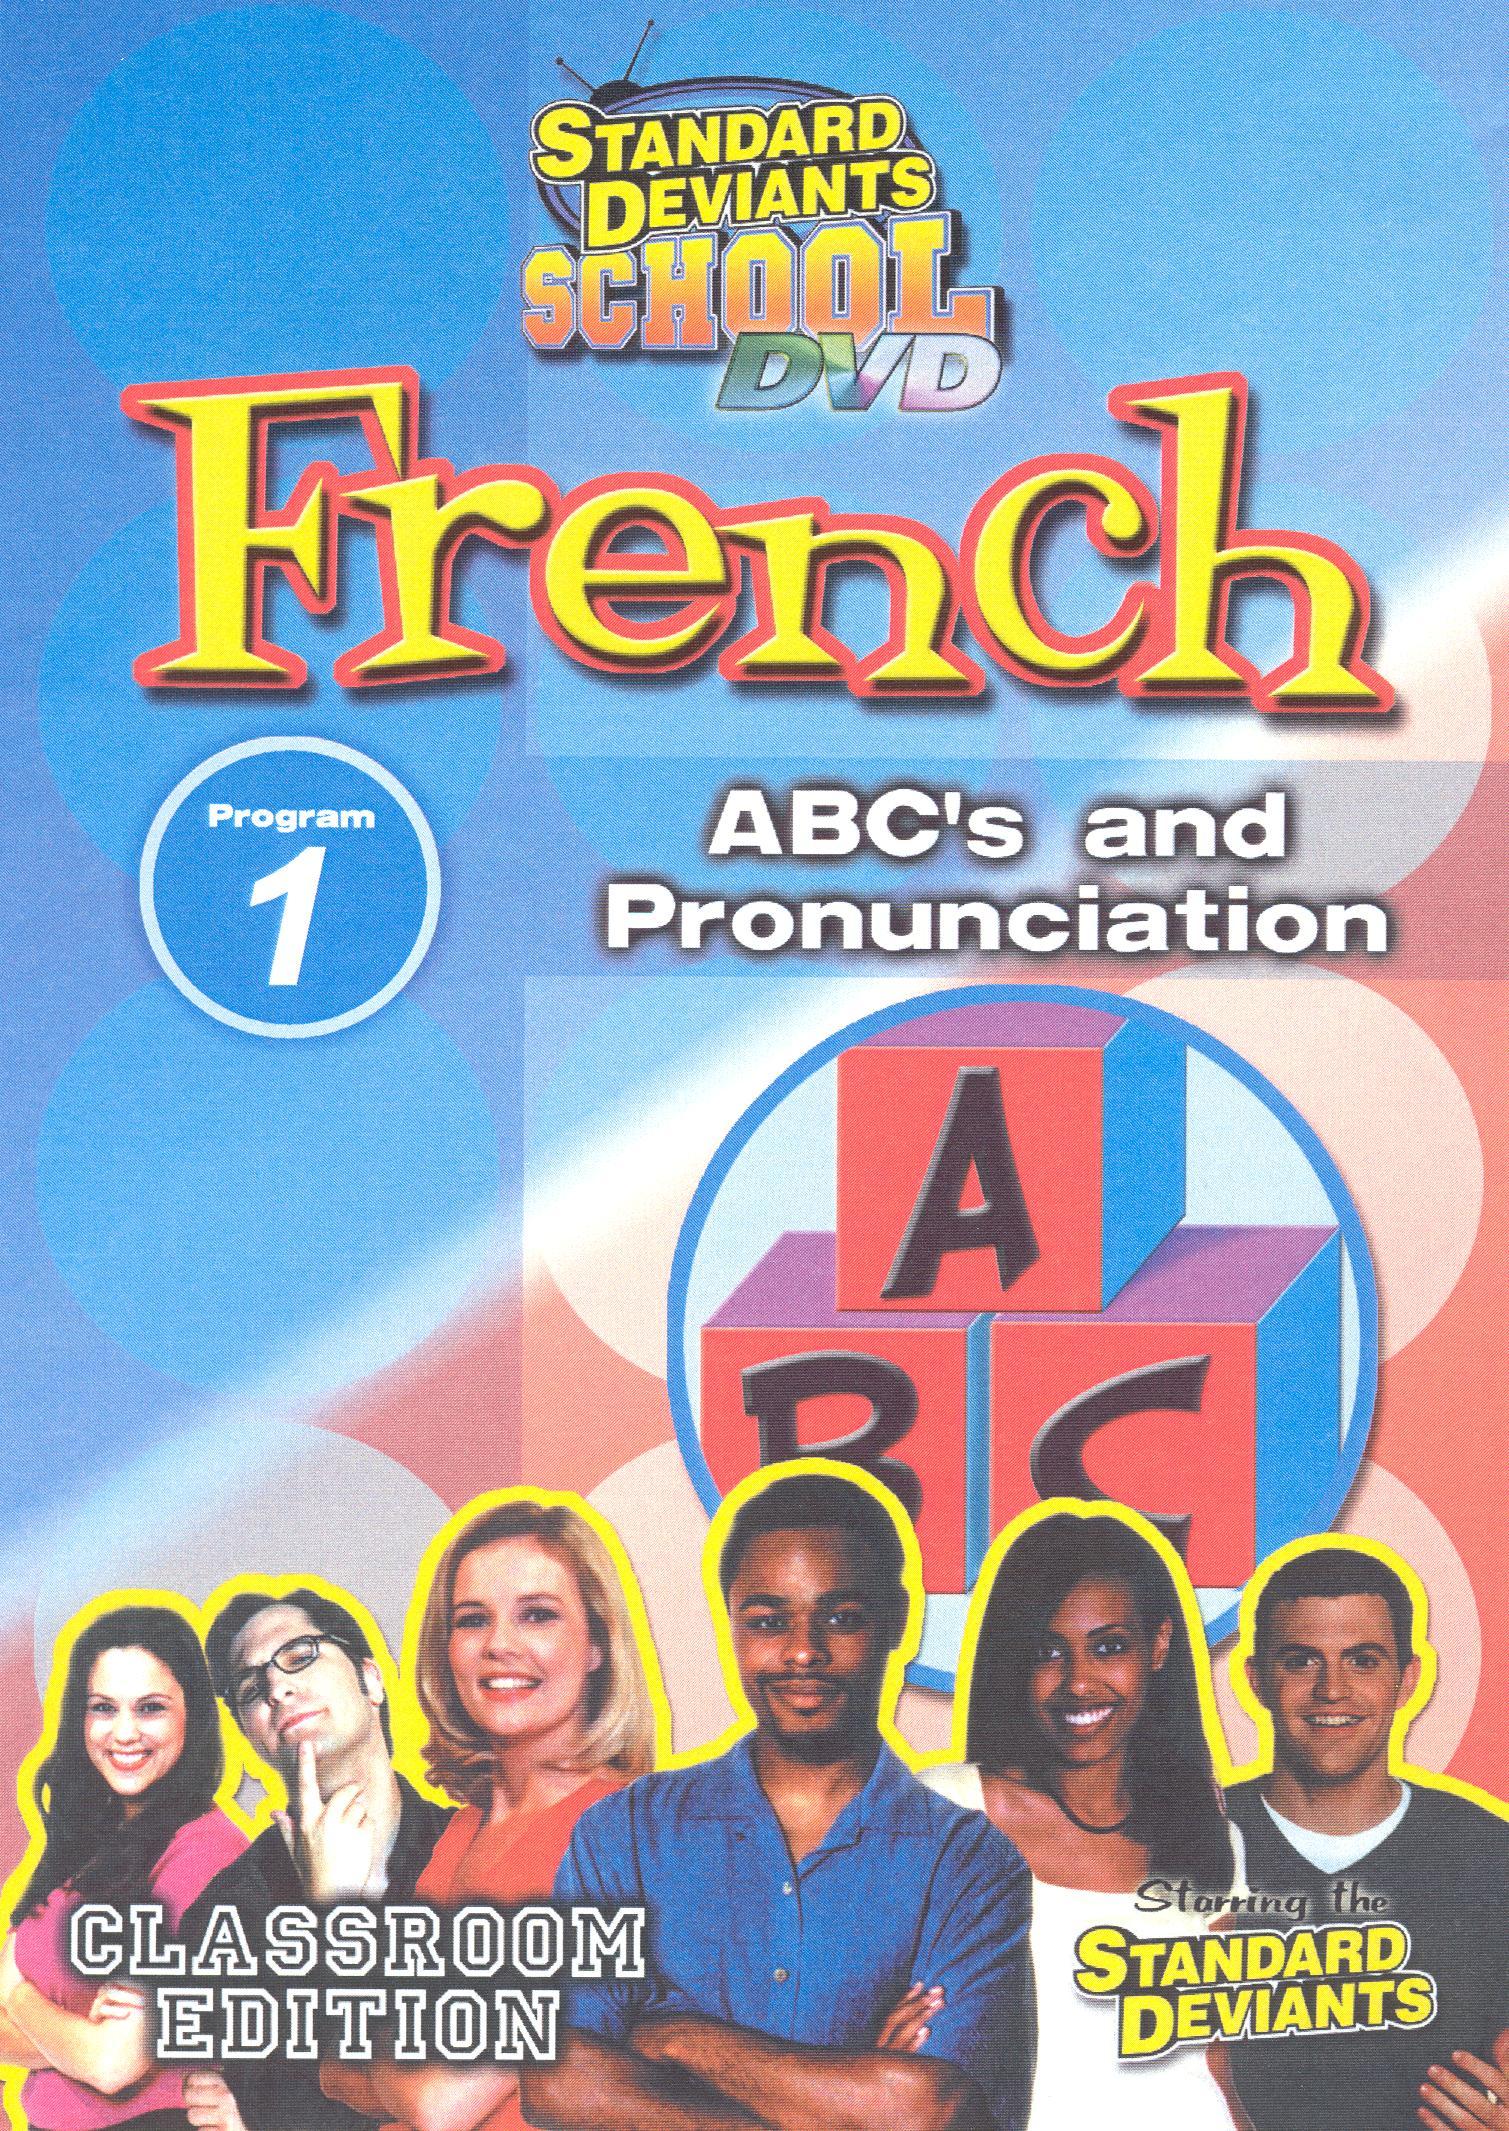 Standard Deviants School: French, Program 1